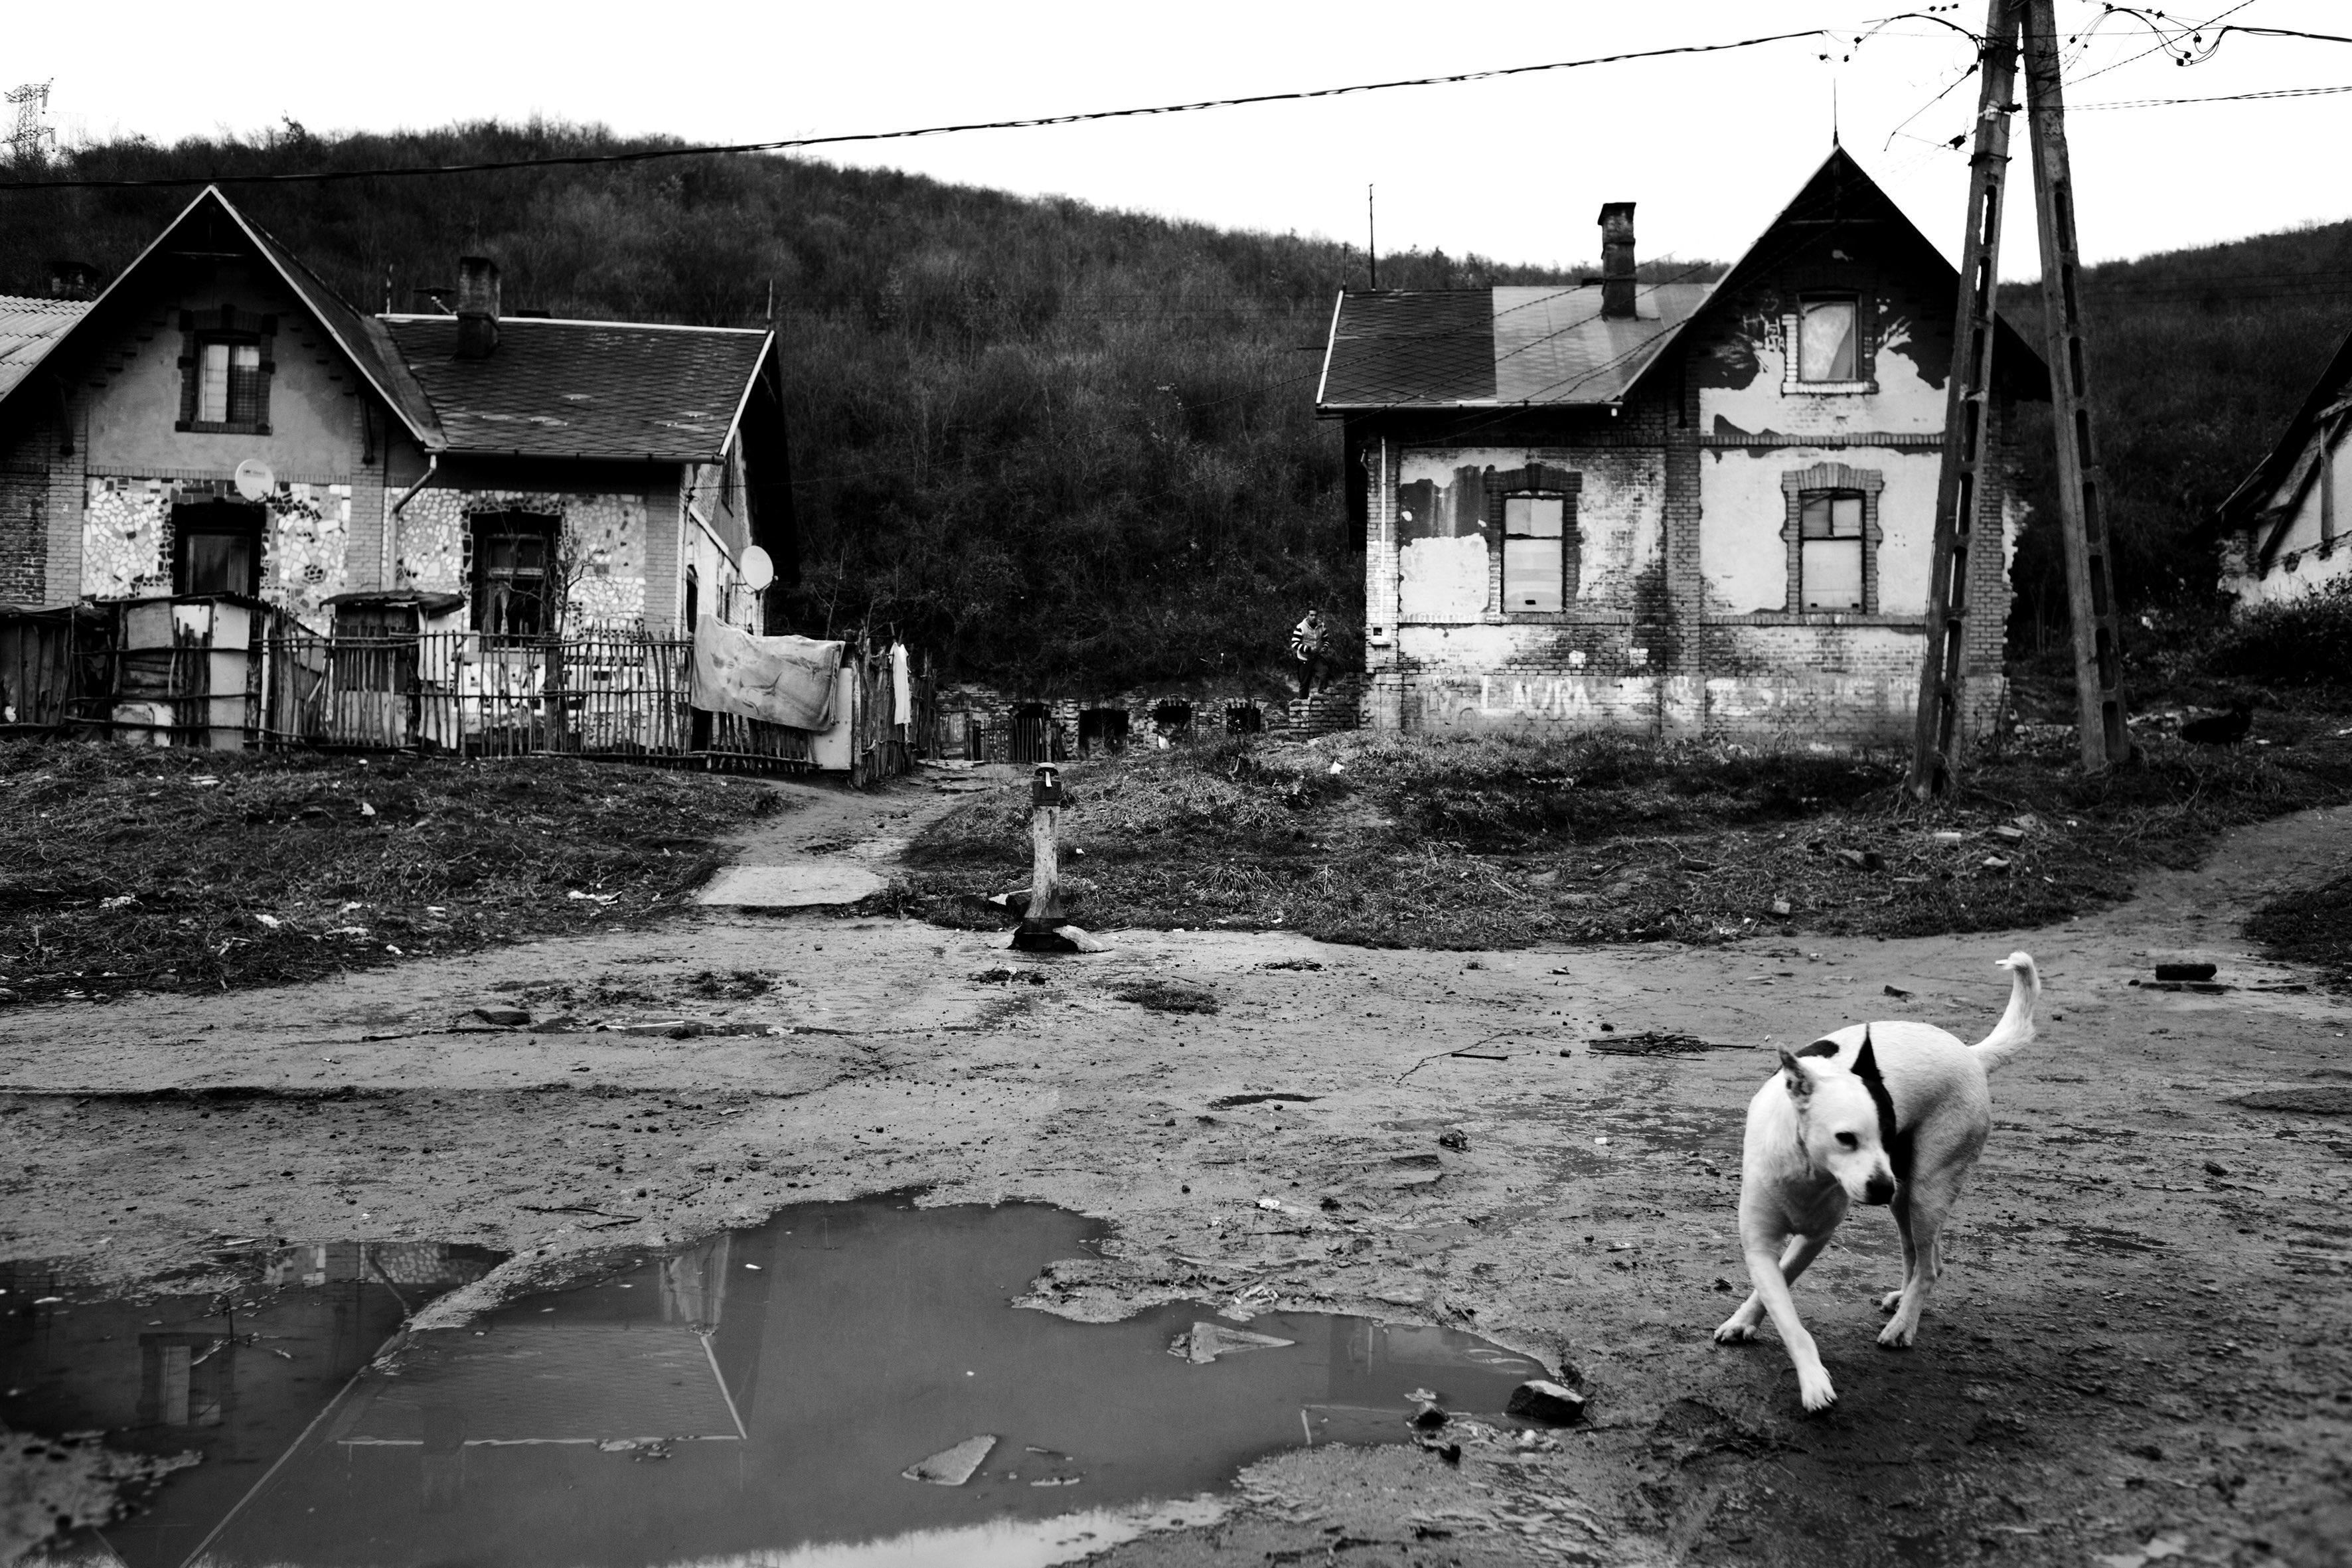 Ozd, Hungary, 2016© Åke Ericson